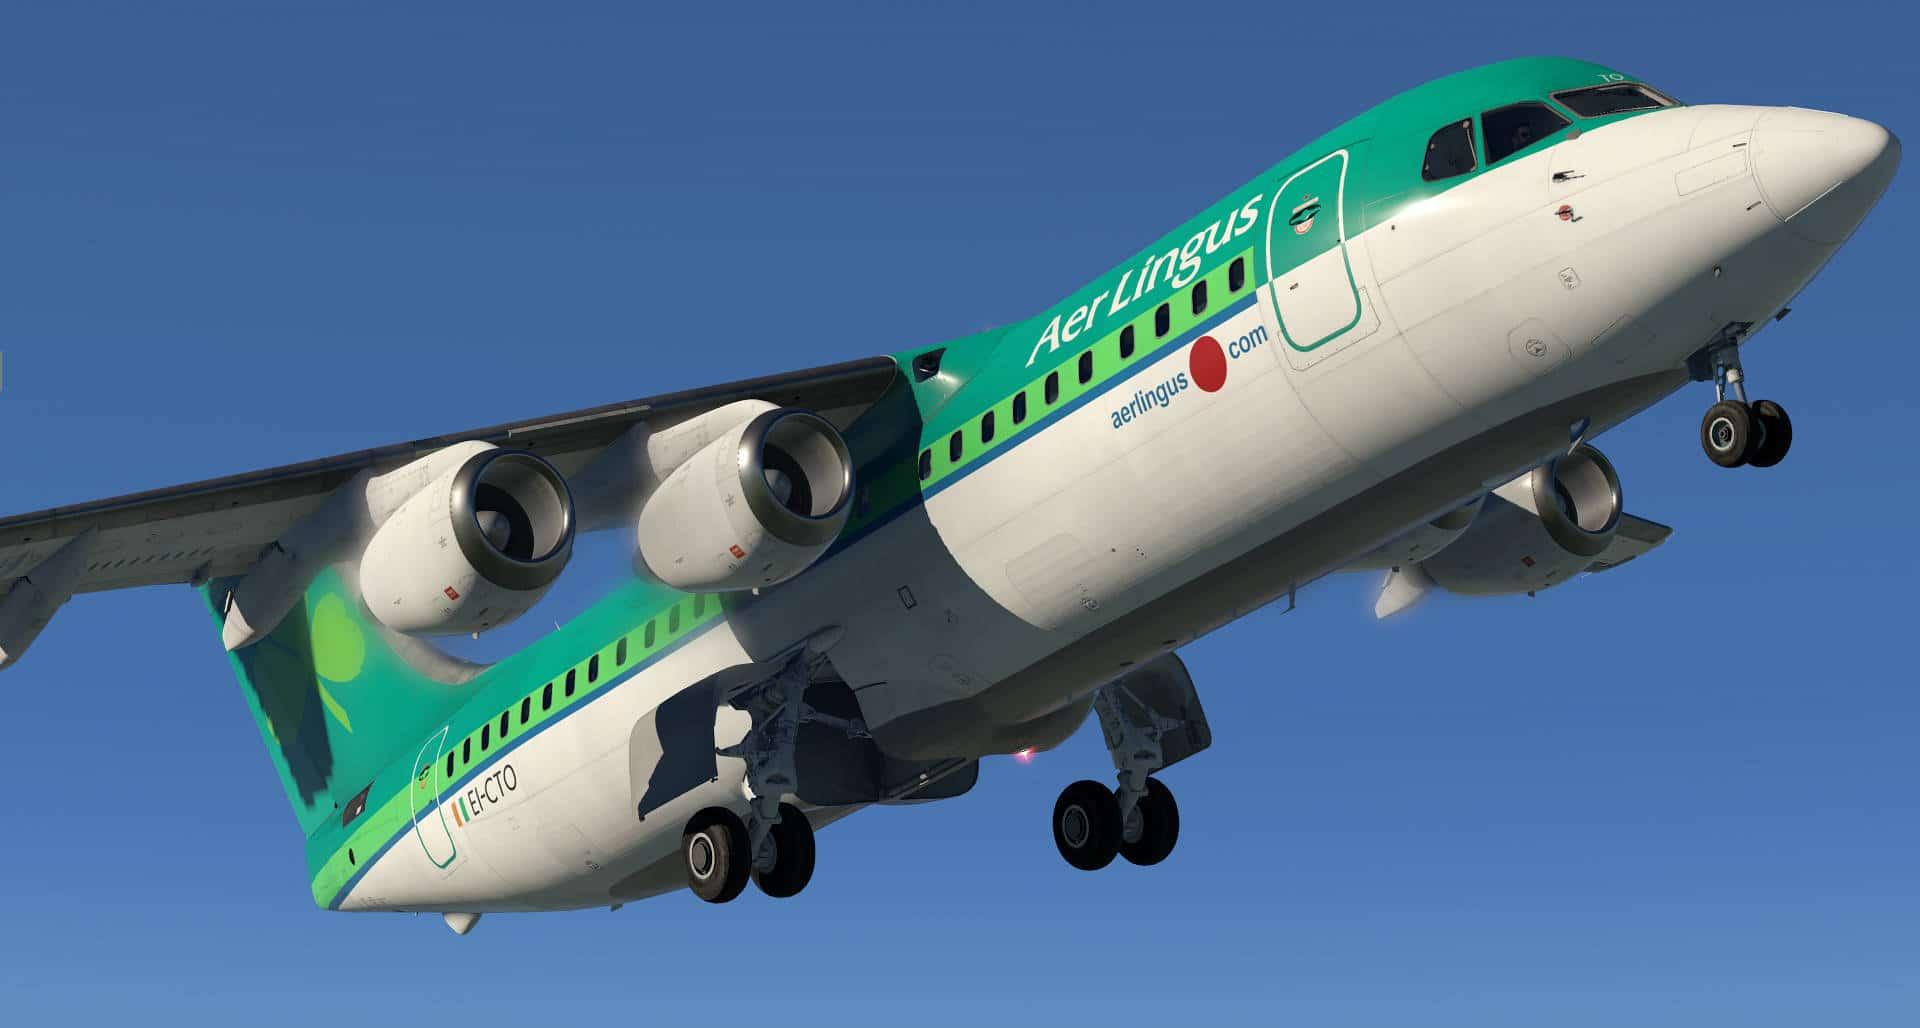 146-professional-xplane_77_ss_l_210409115601